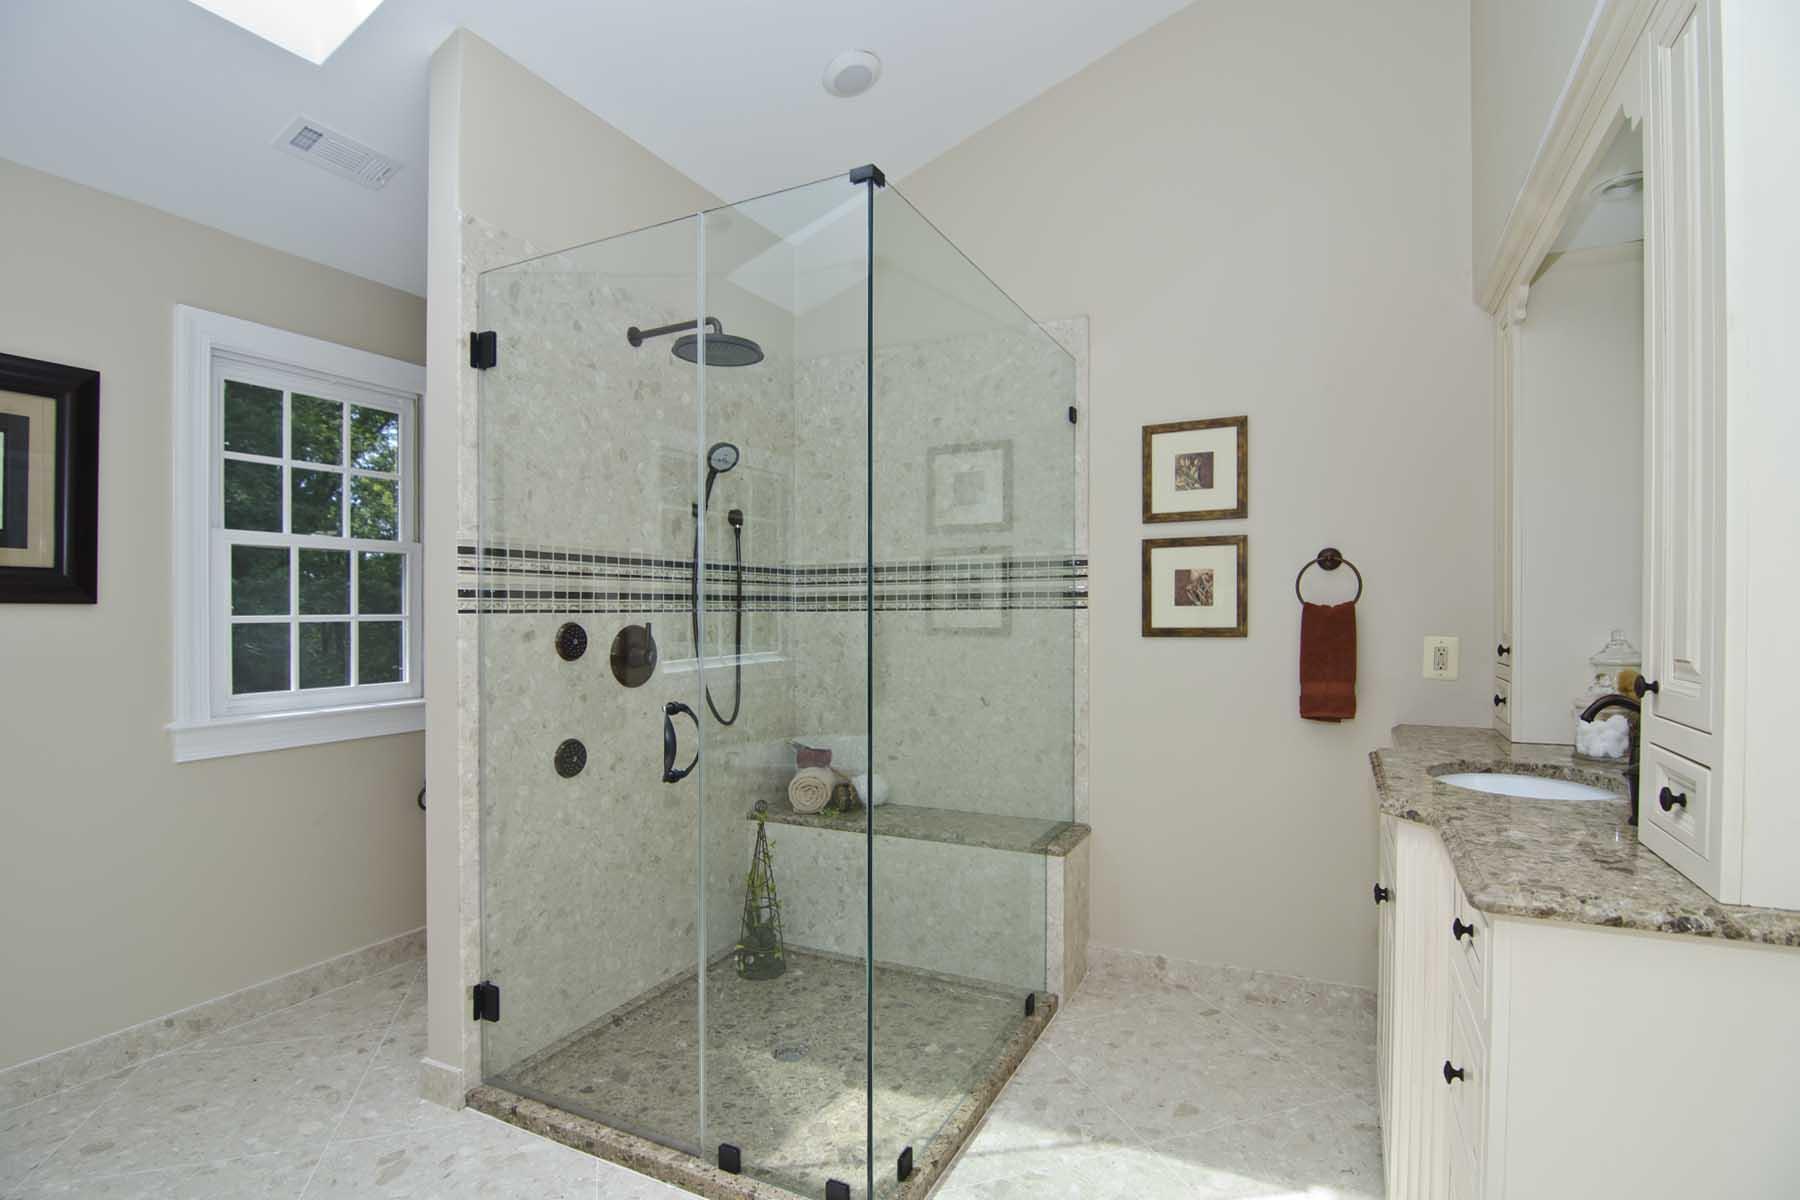 Verona Showers marble walls and custom-made MarbaFloor